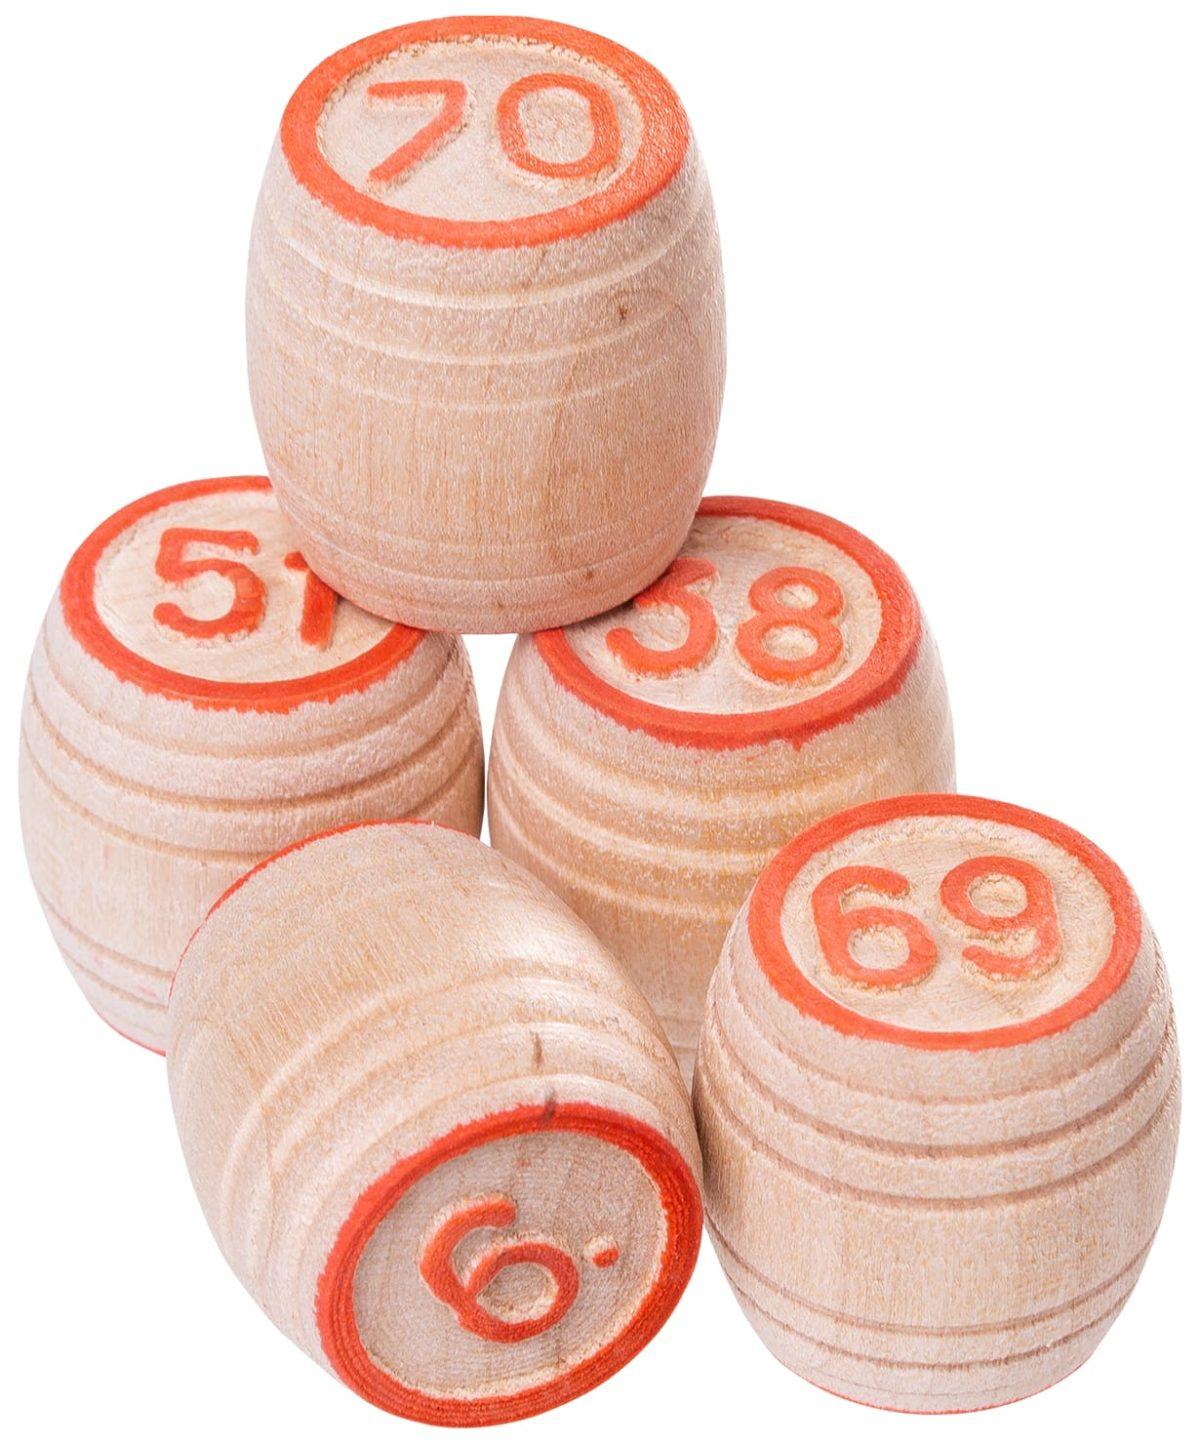 Лото бочонок деревянный, картонная коробка  004-07 - 2